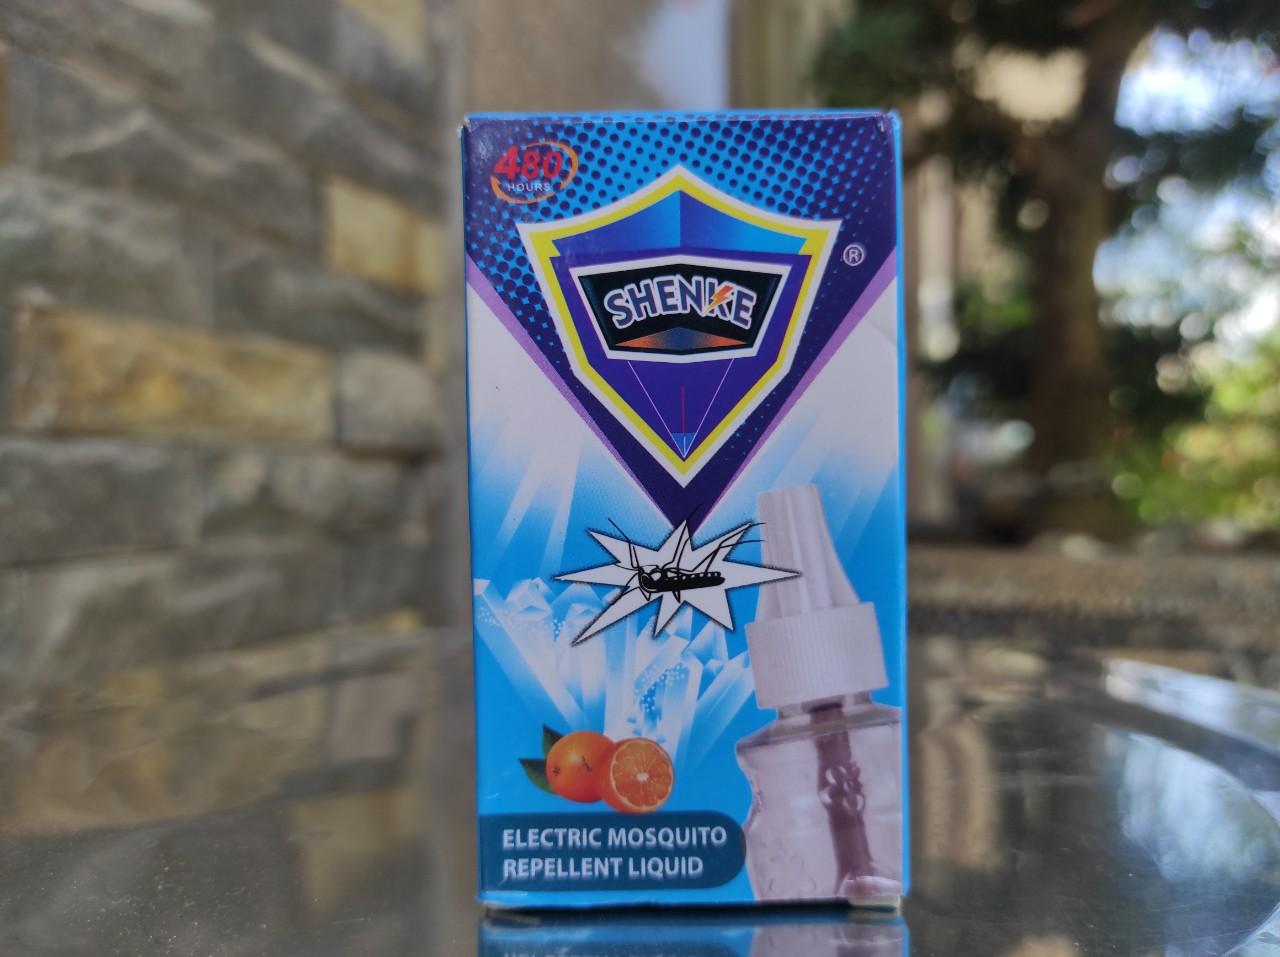 Tinh Dầu Đuổi Muỗi Shenke Electric Mosquito